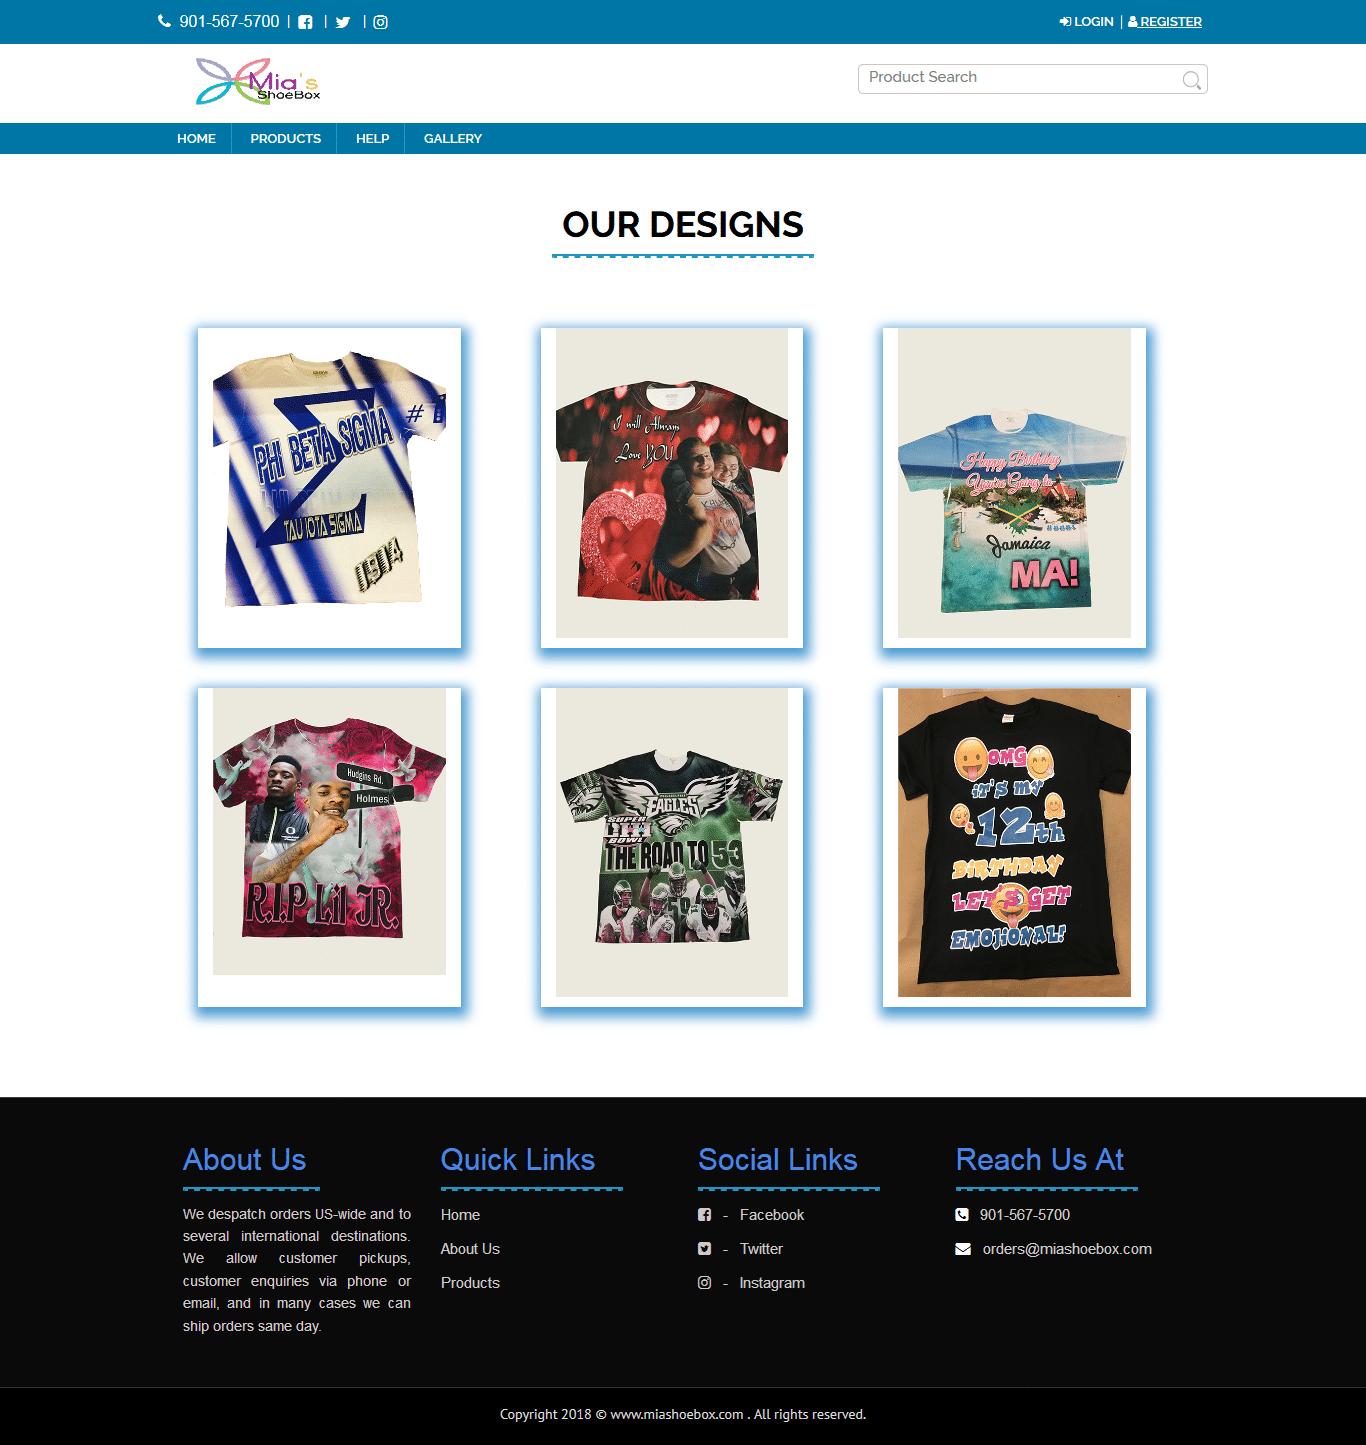 Miashoebox t-shirt designs